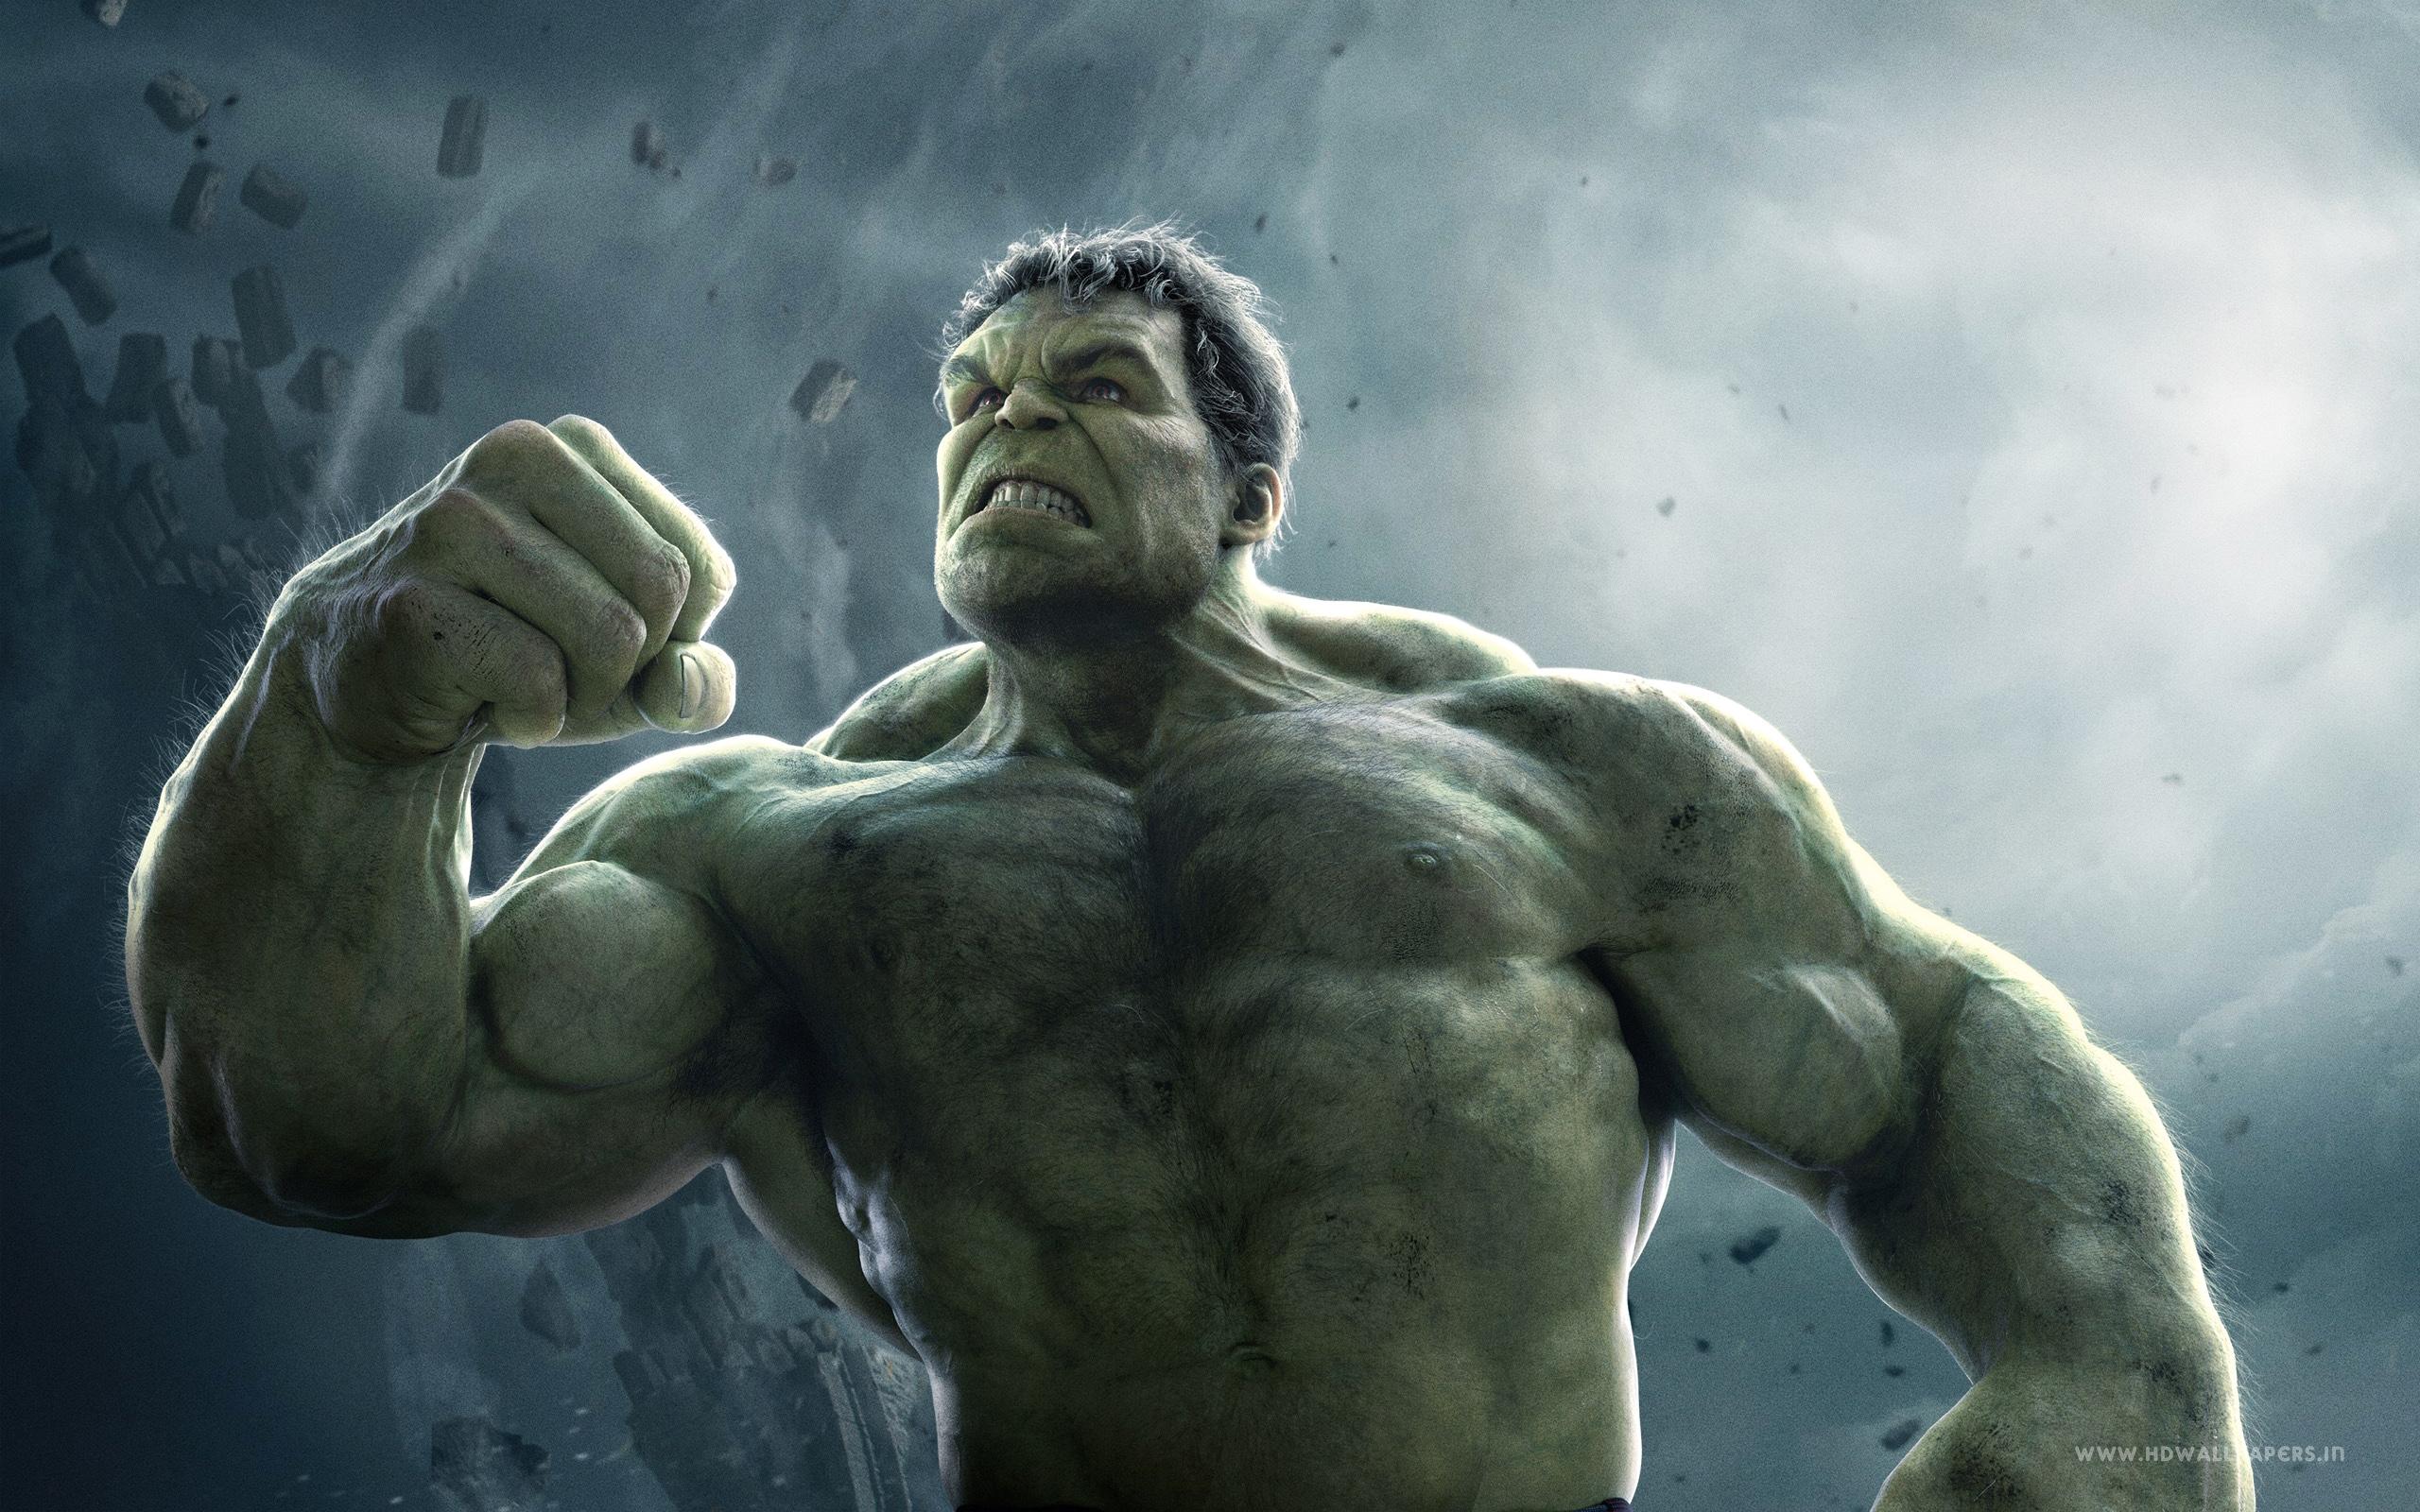 HD Wallpapers Avengers Age of Ultron Hulk